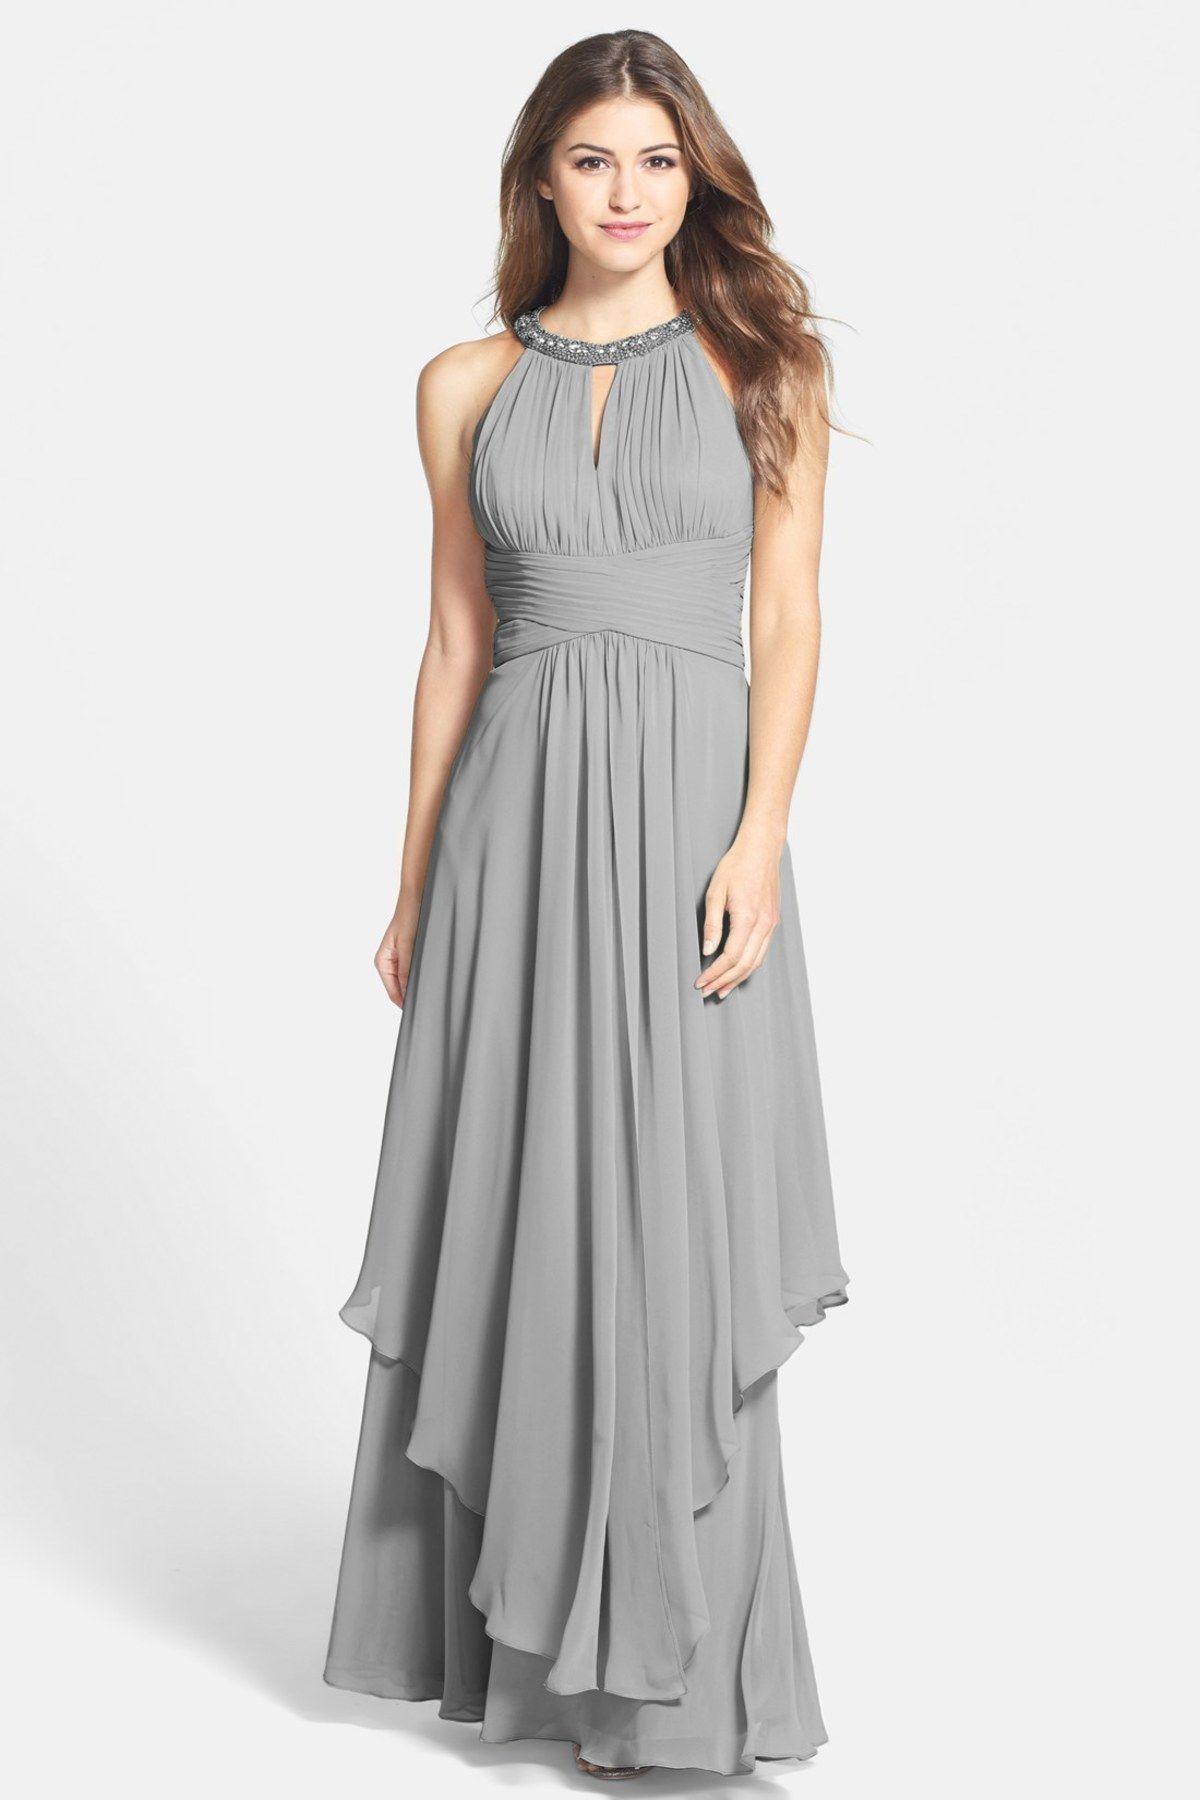 Embellished Tiered Chiffon Halter Gown | wedding dress | Pinterest ...